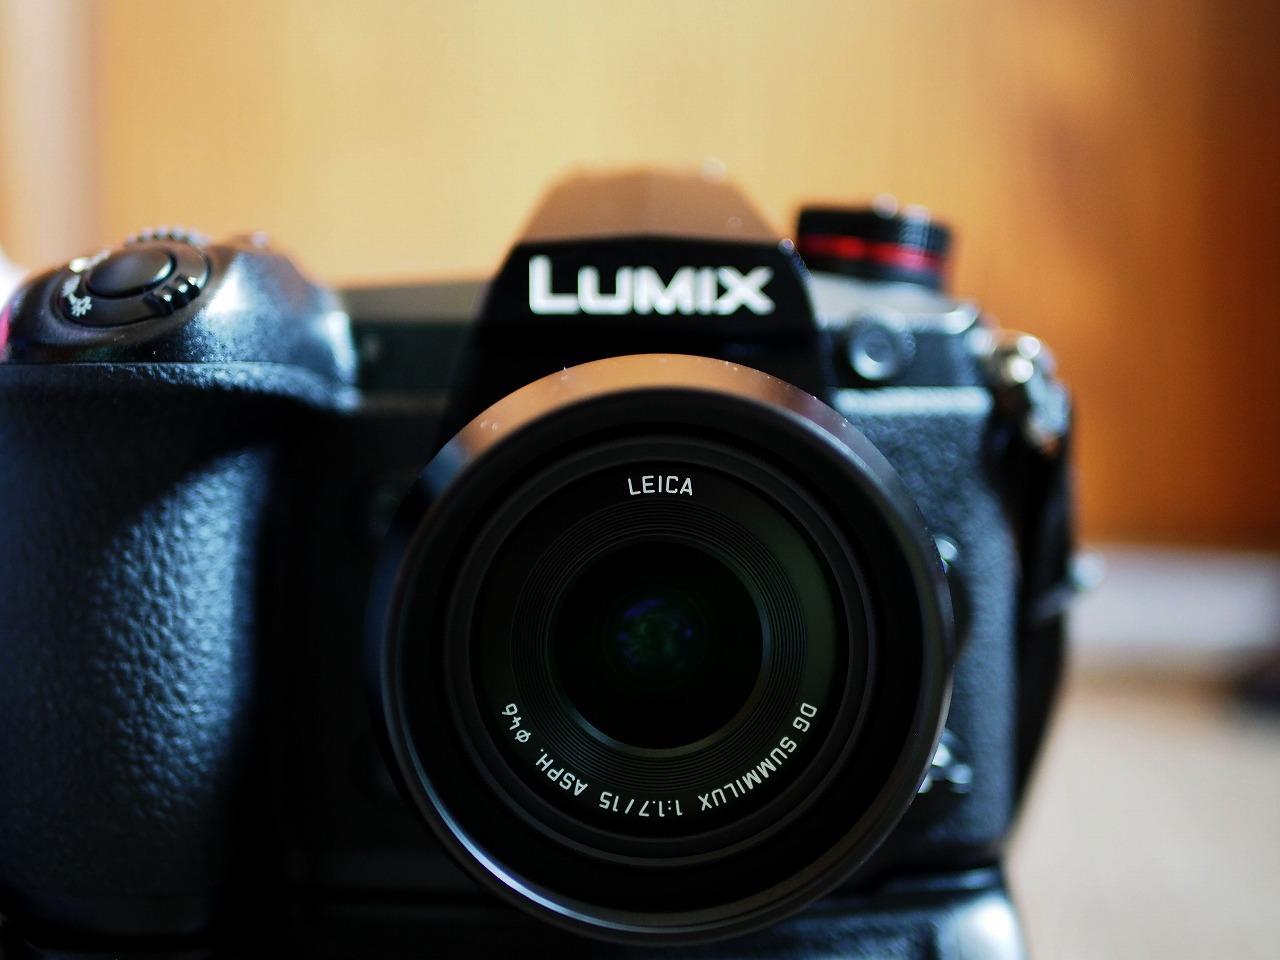 【Lumix】Leica Summilux 15mmF1.7 ASPH 【購入しました】